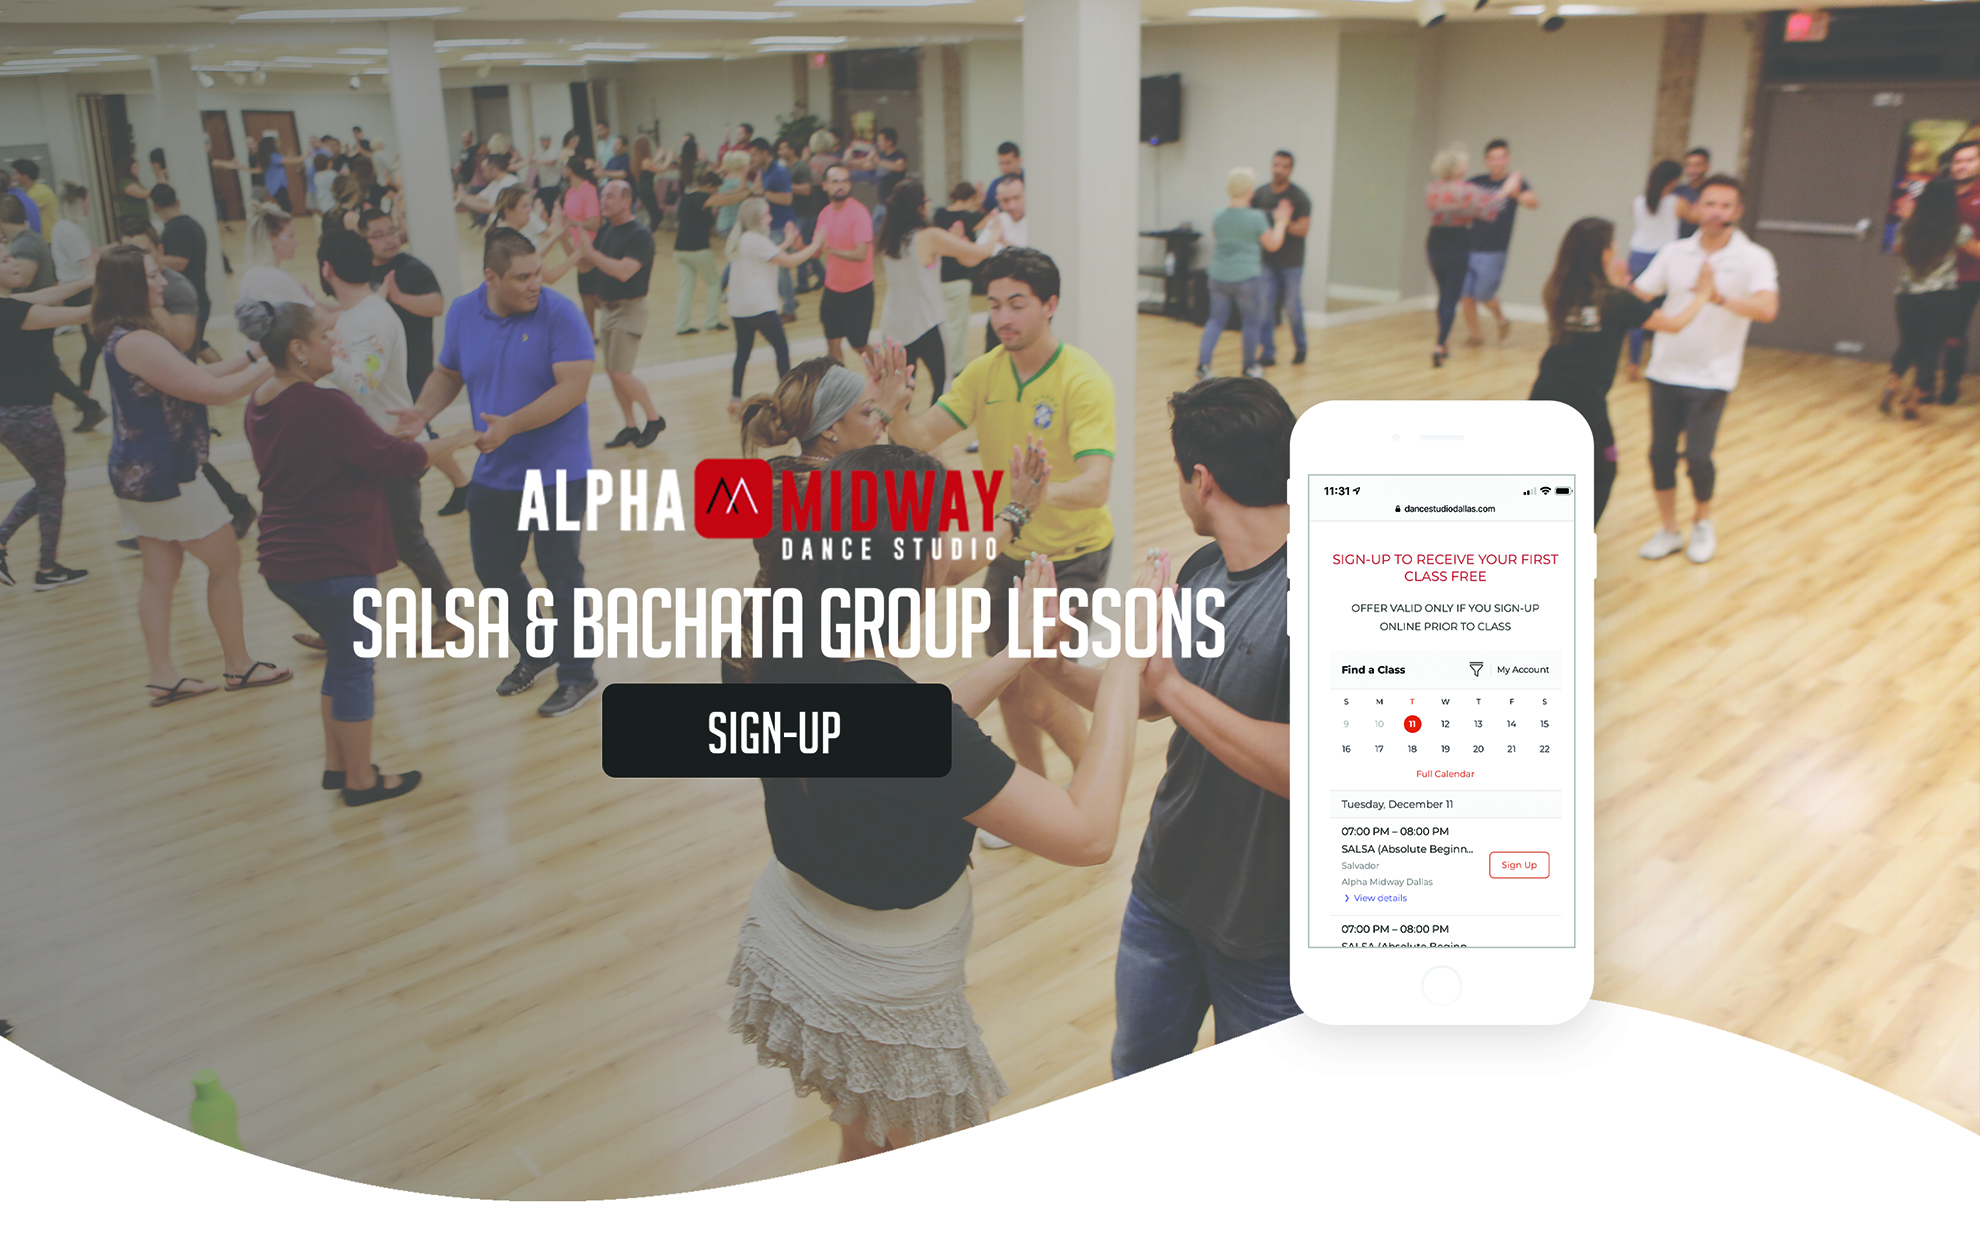 group-lessons-salsa-bachata-dallas